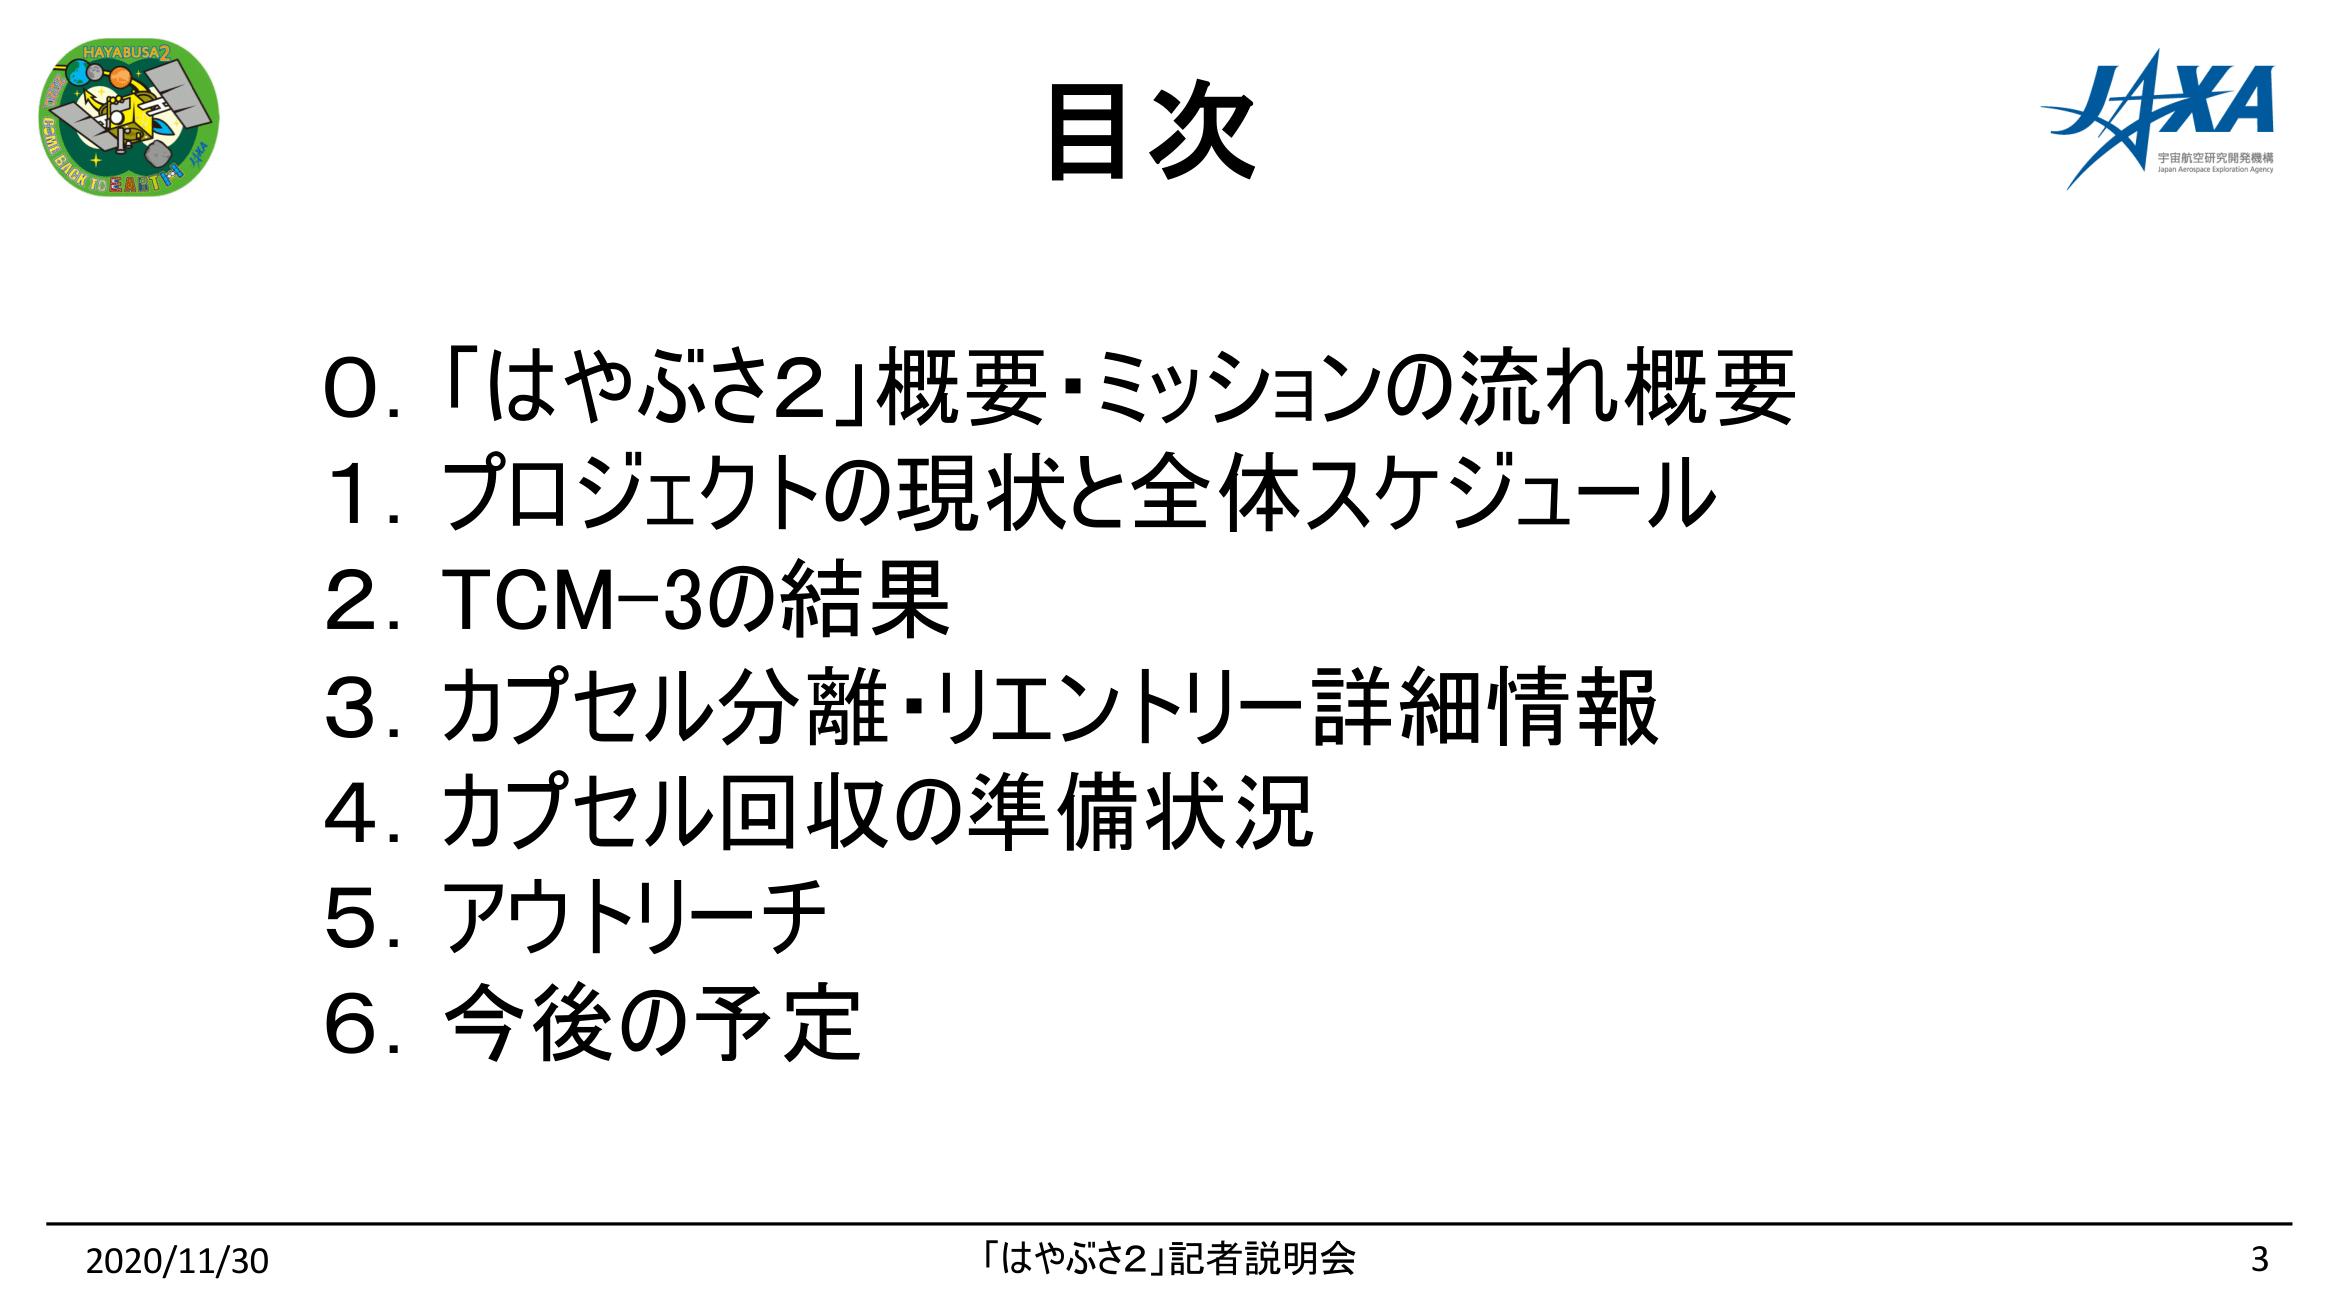 f:id:Imamura:20201130153928p:plain